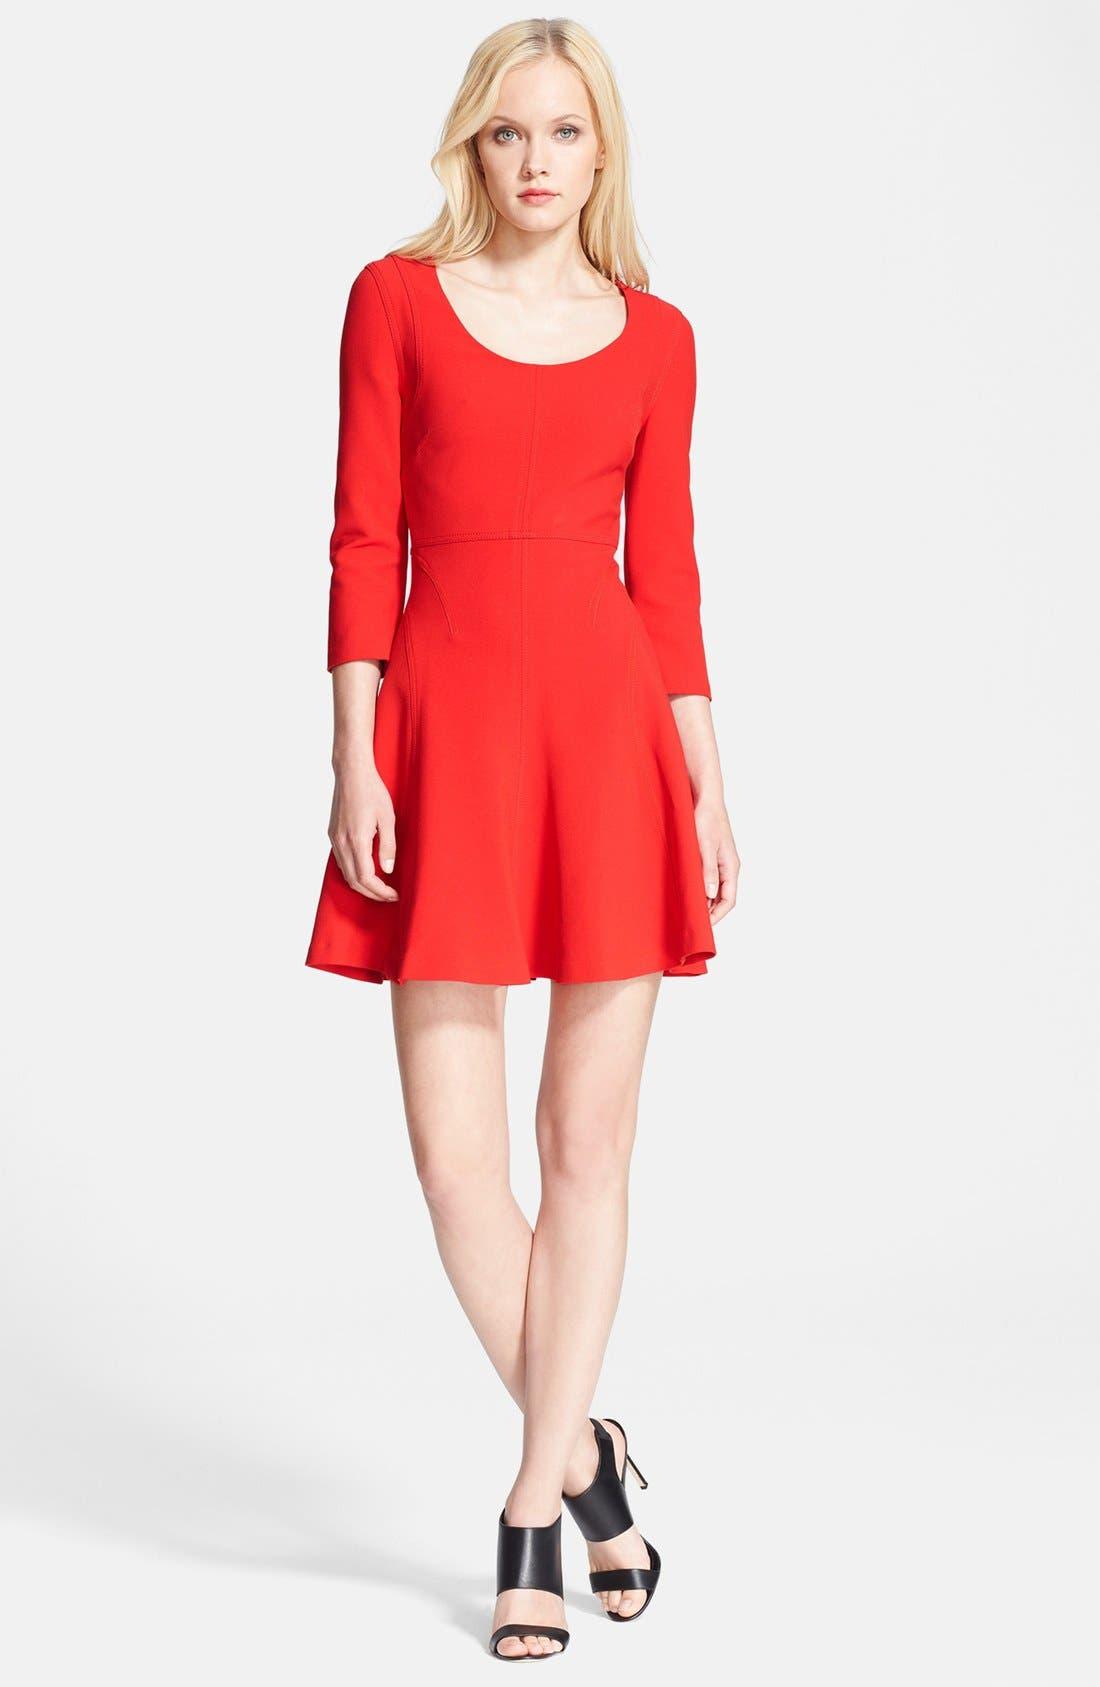 Alternate Image 1 Selected - Diane von Furstenberg 'Paloma' Woven Fit & Flare Dress